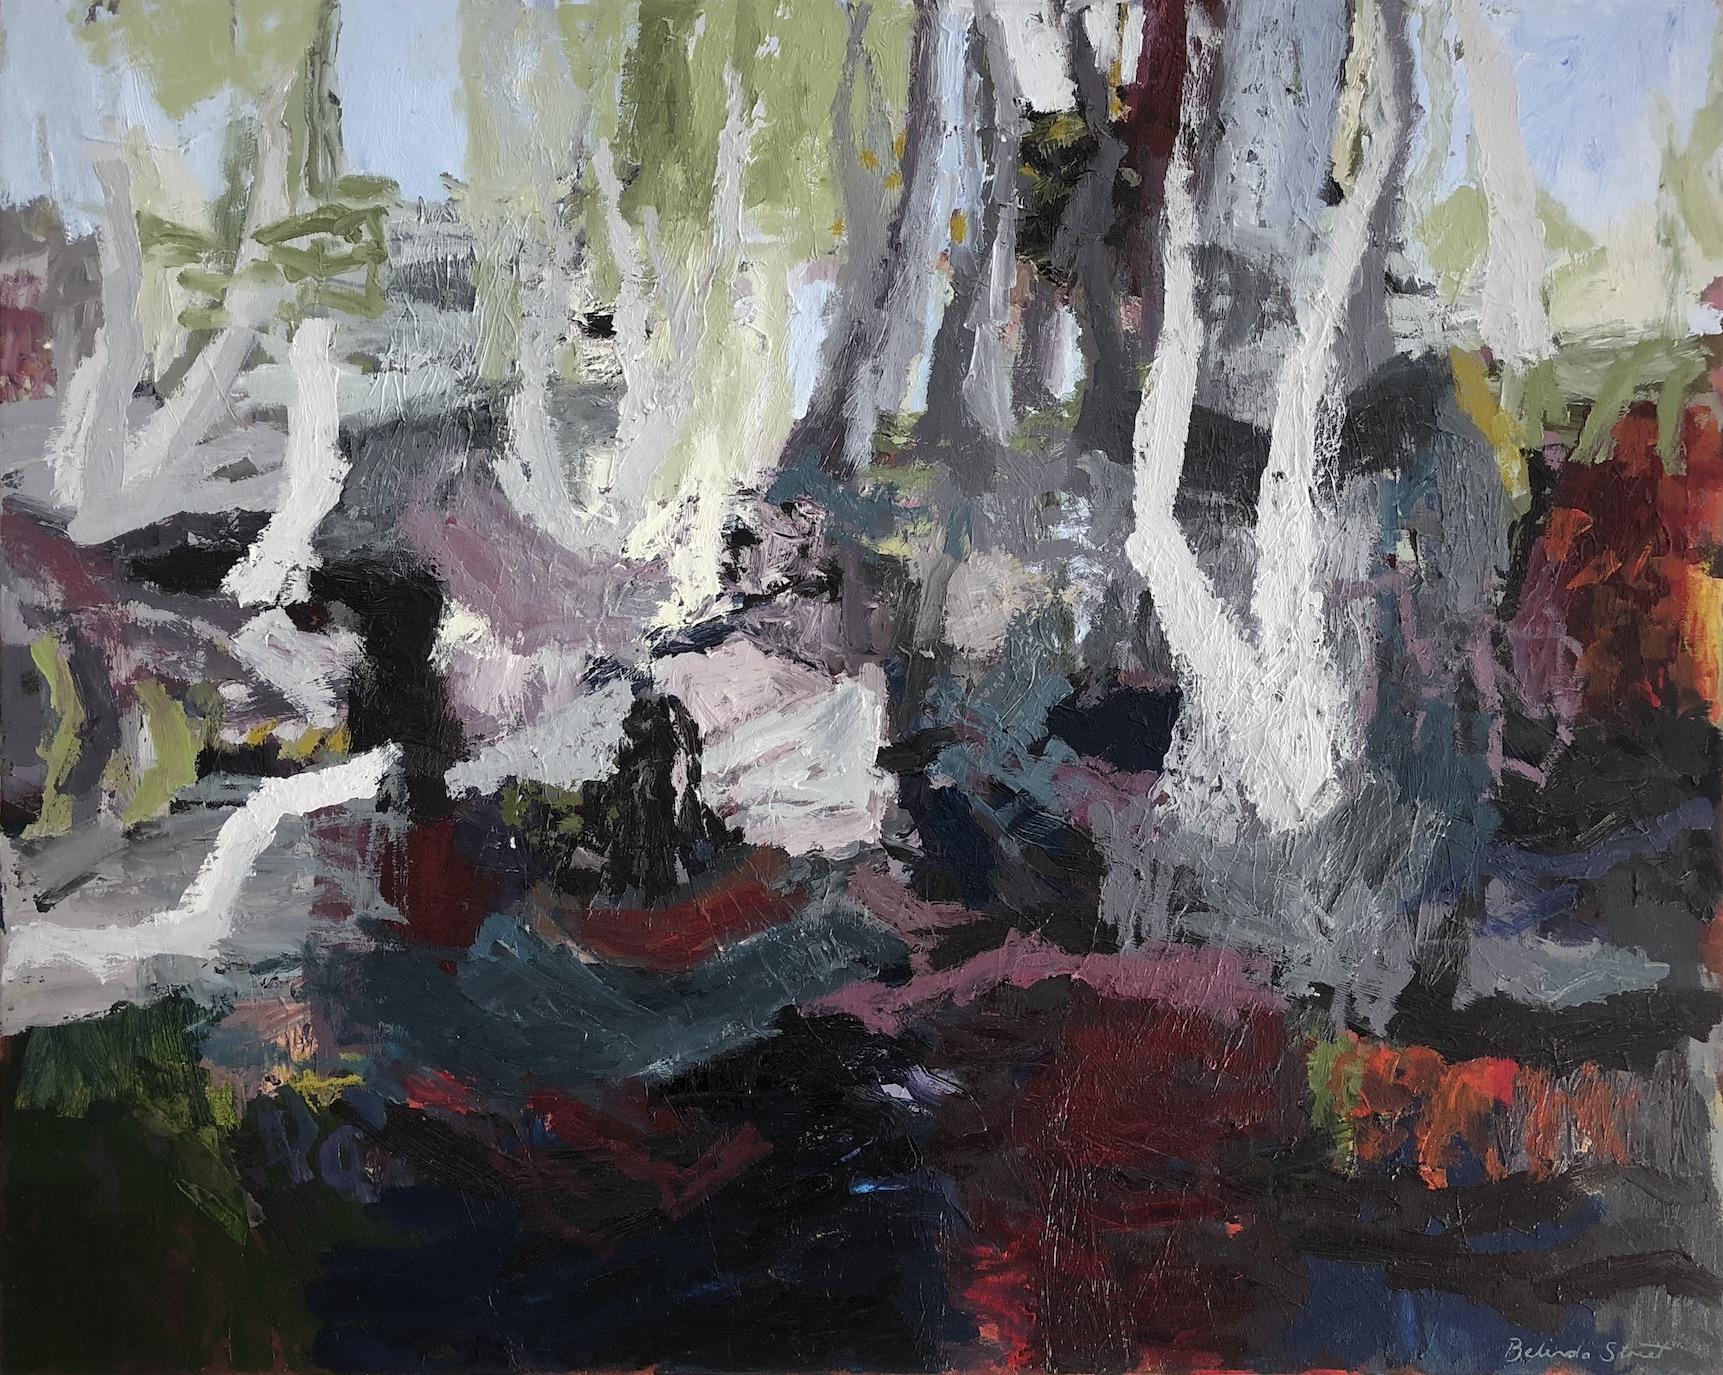 Belinda Street  Ganguddy Depths  2018 oil on canvas 80 x 100cm  $2500.00